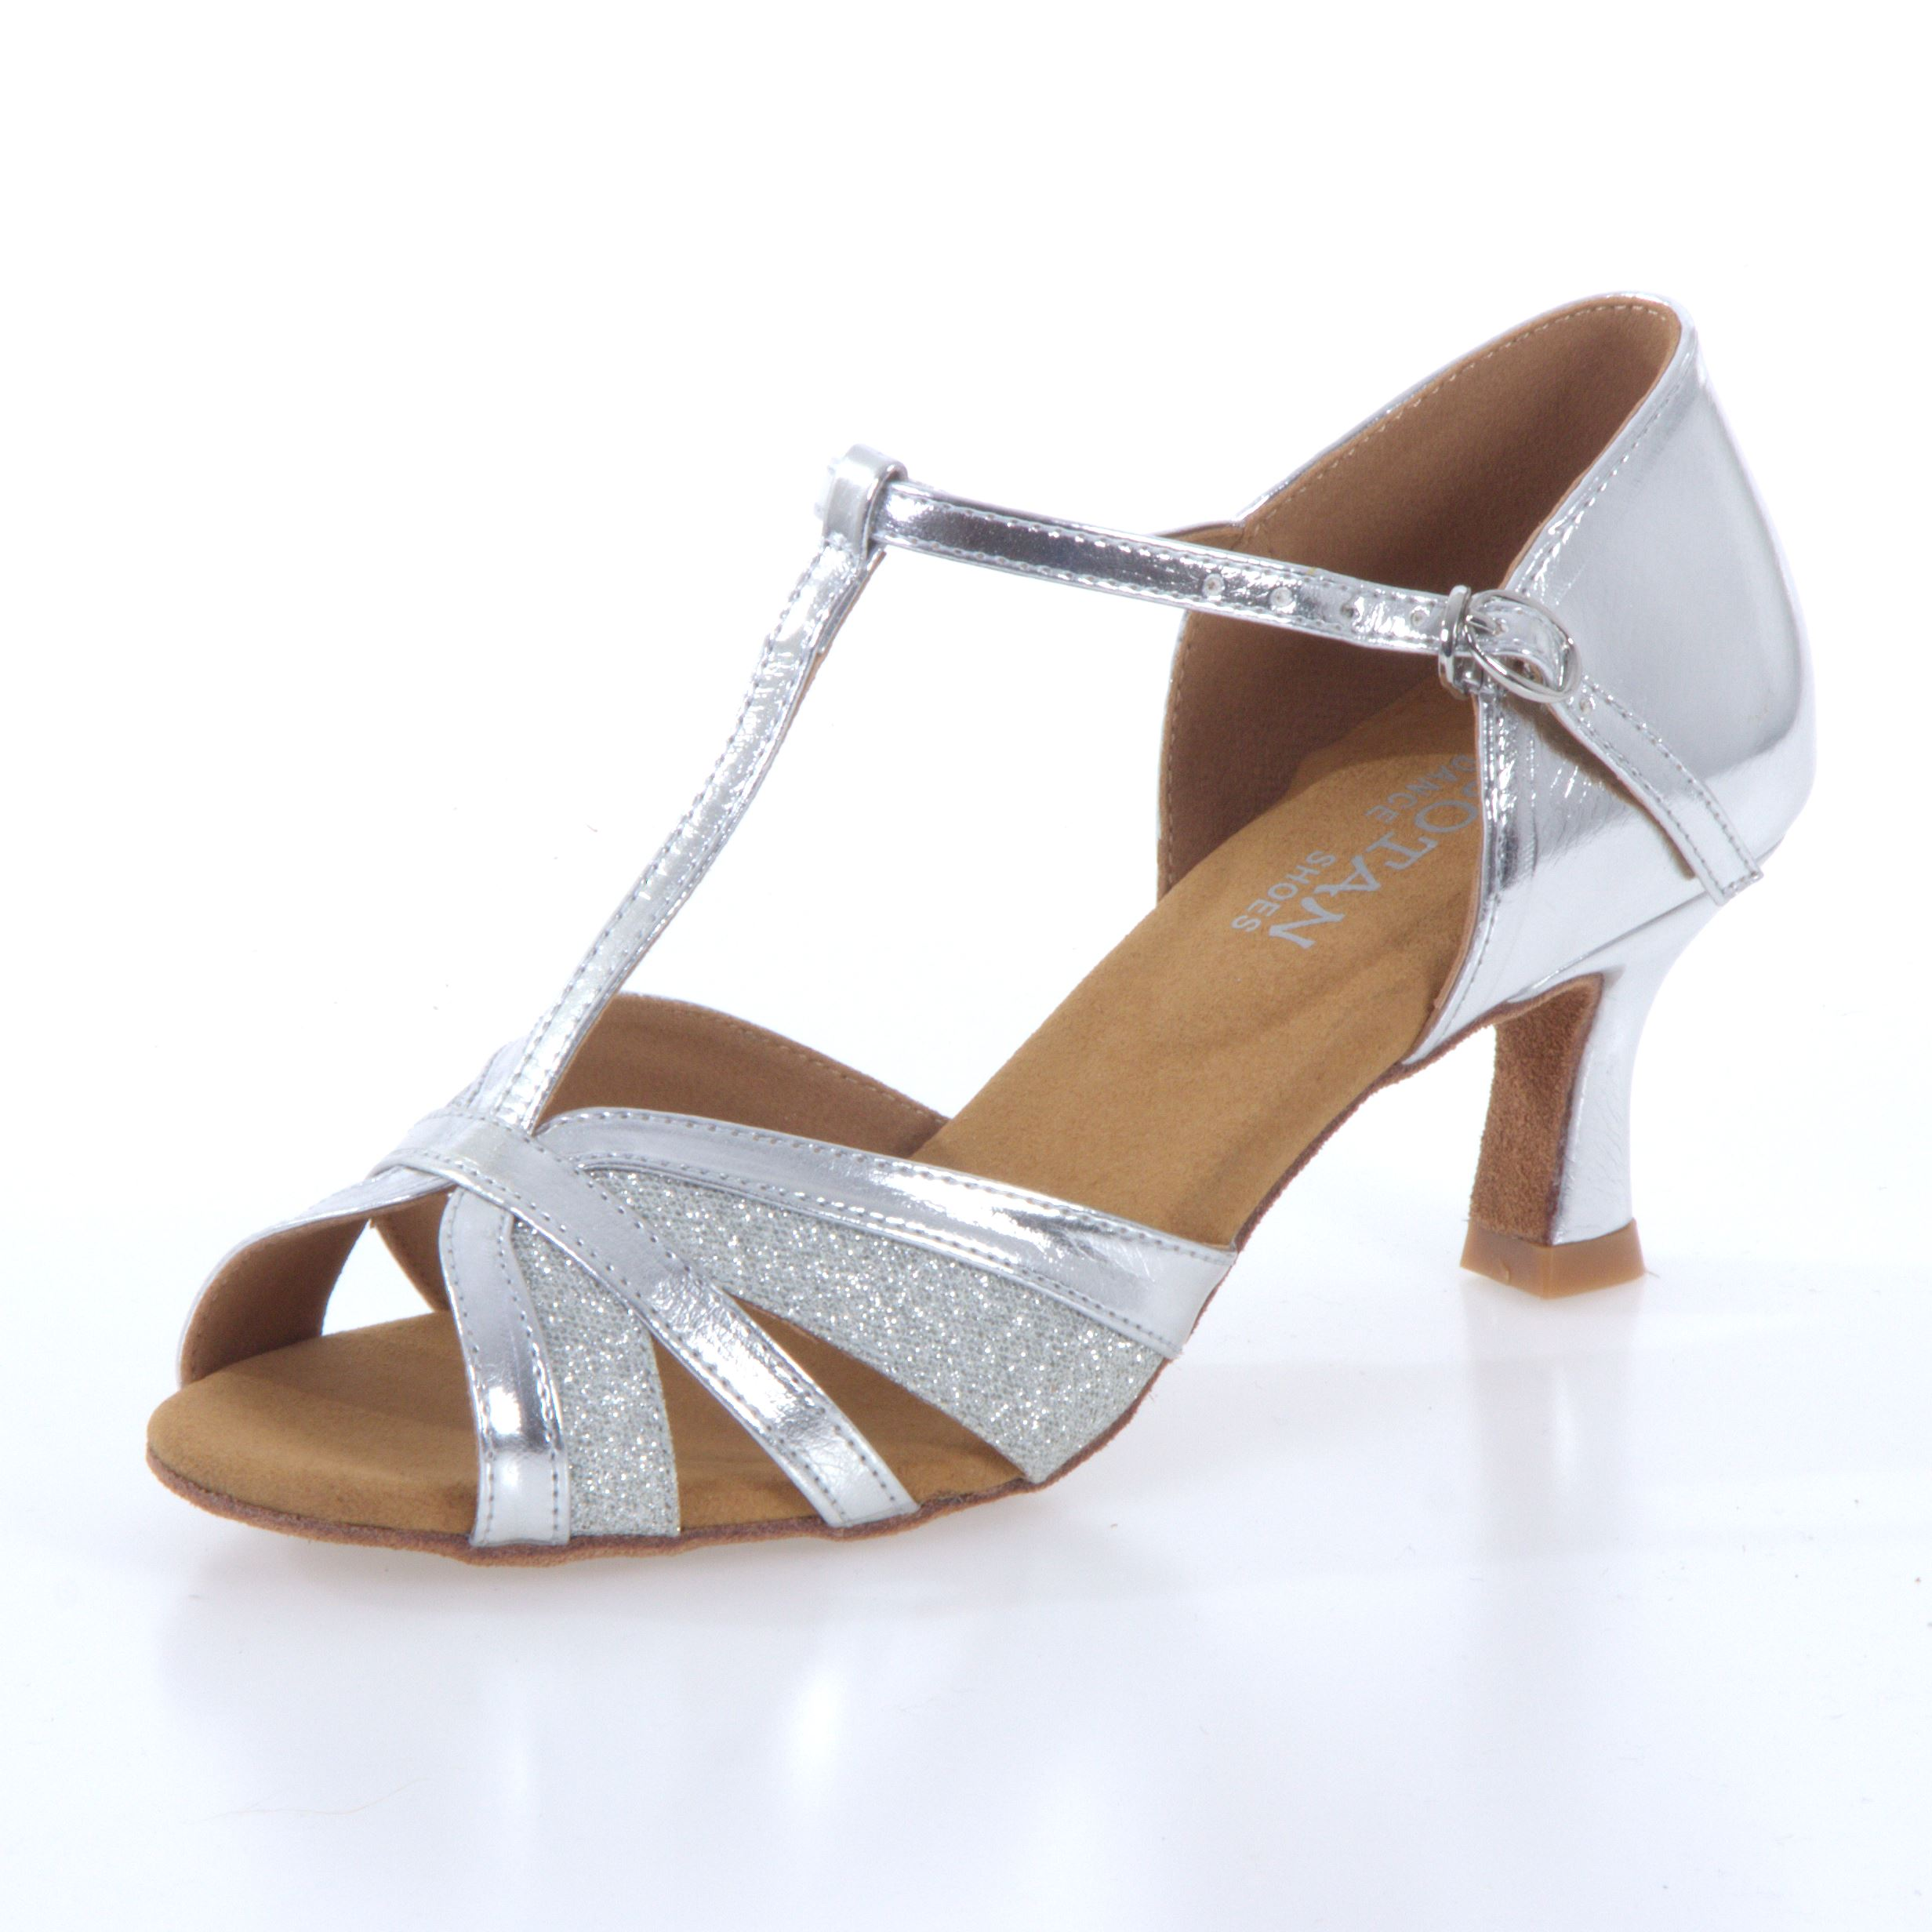 d6e6abf992a2 Tanečné topánky Botan BL-8 is